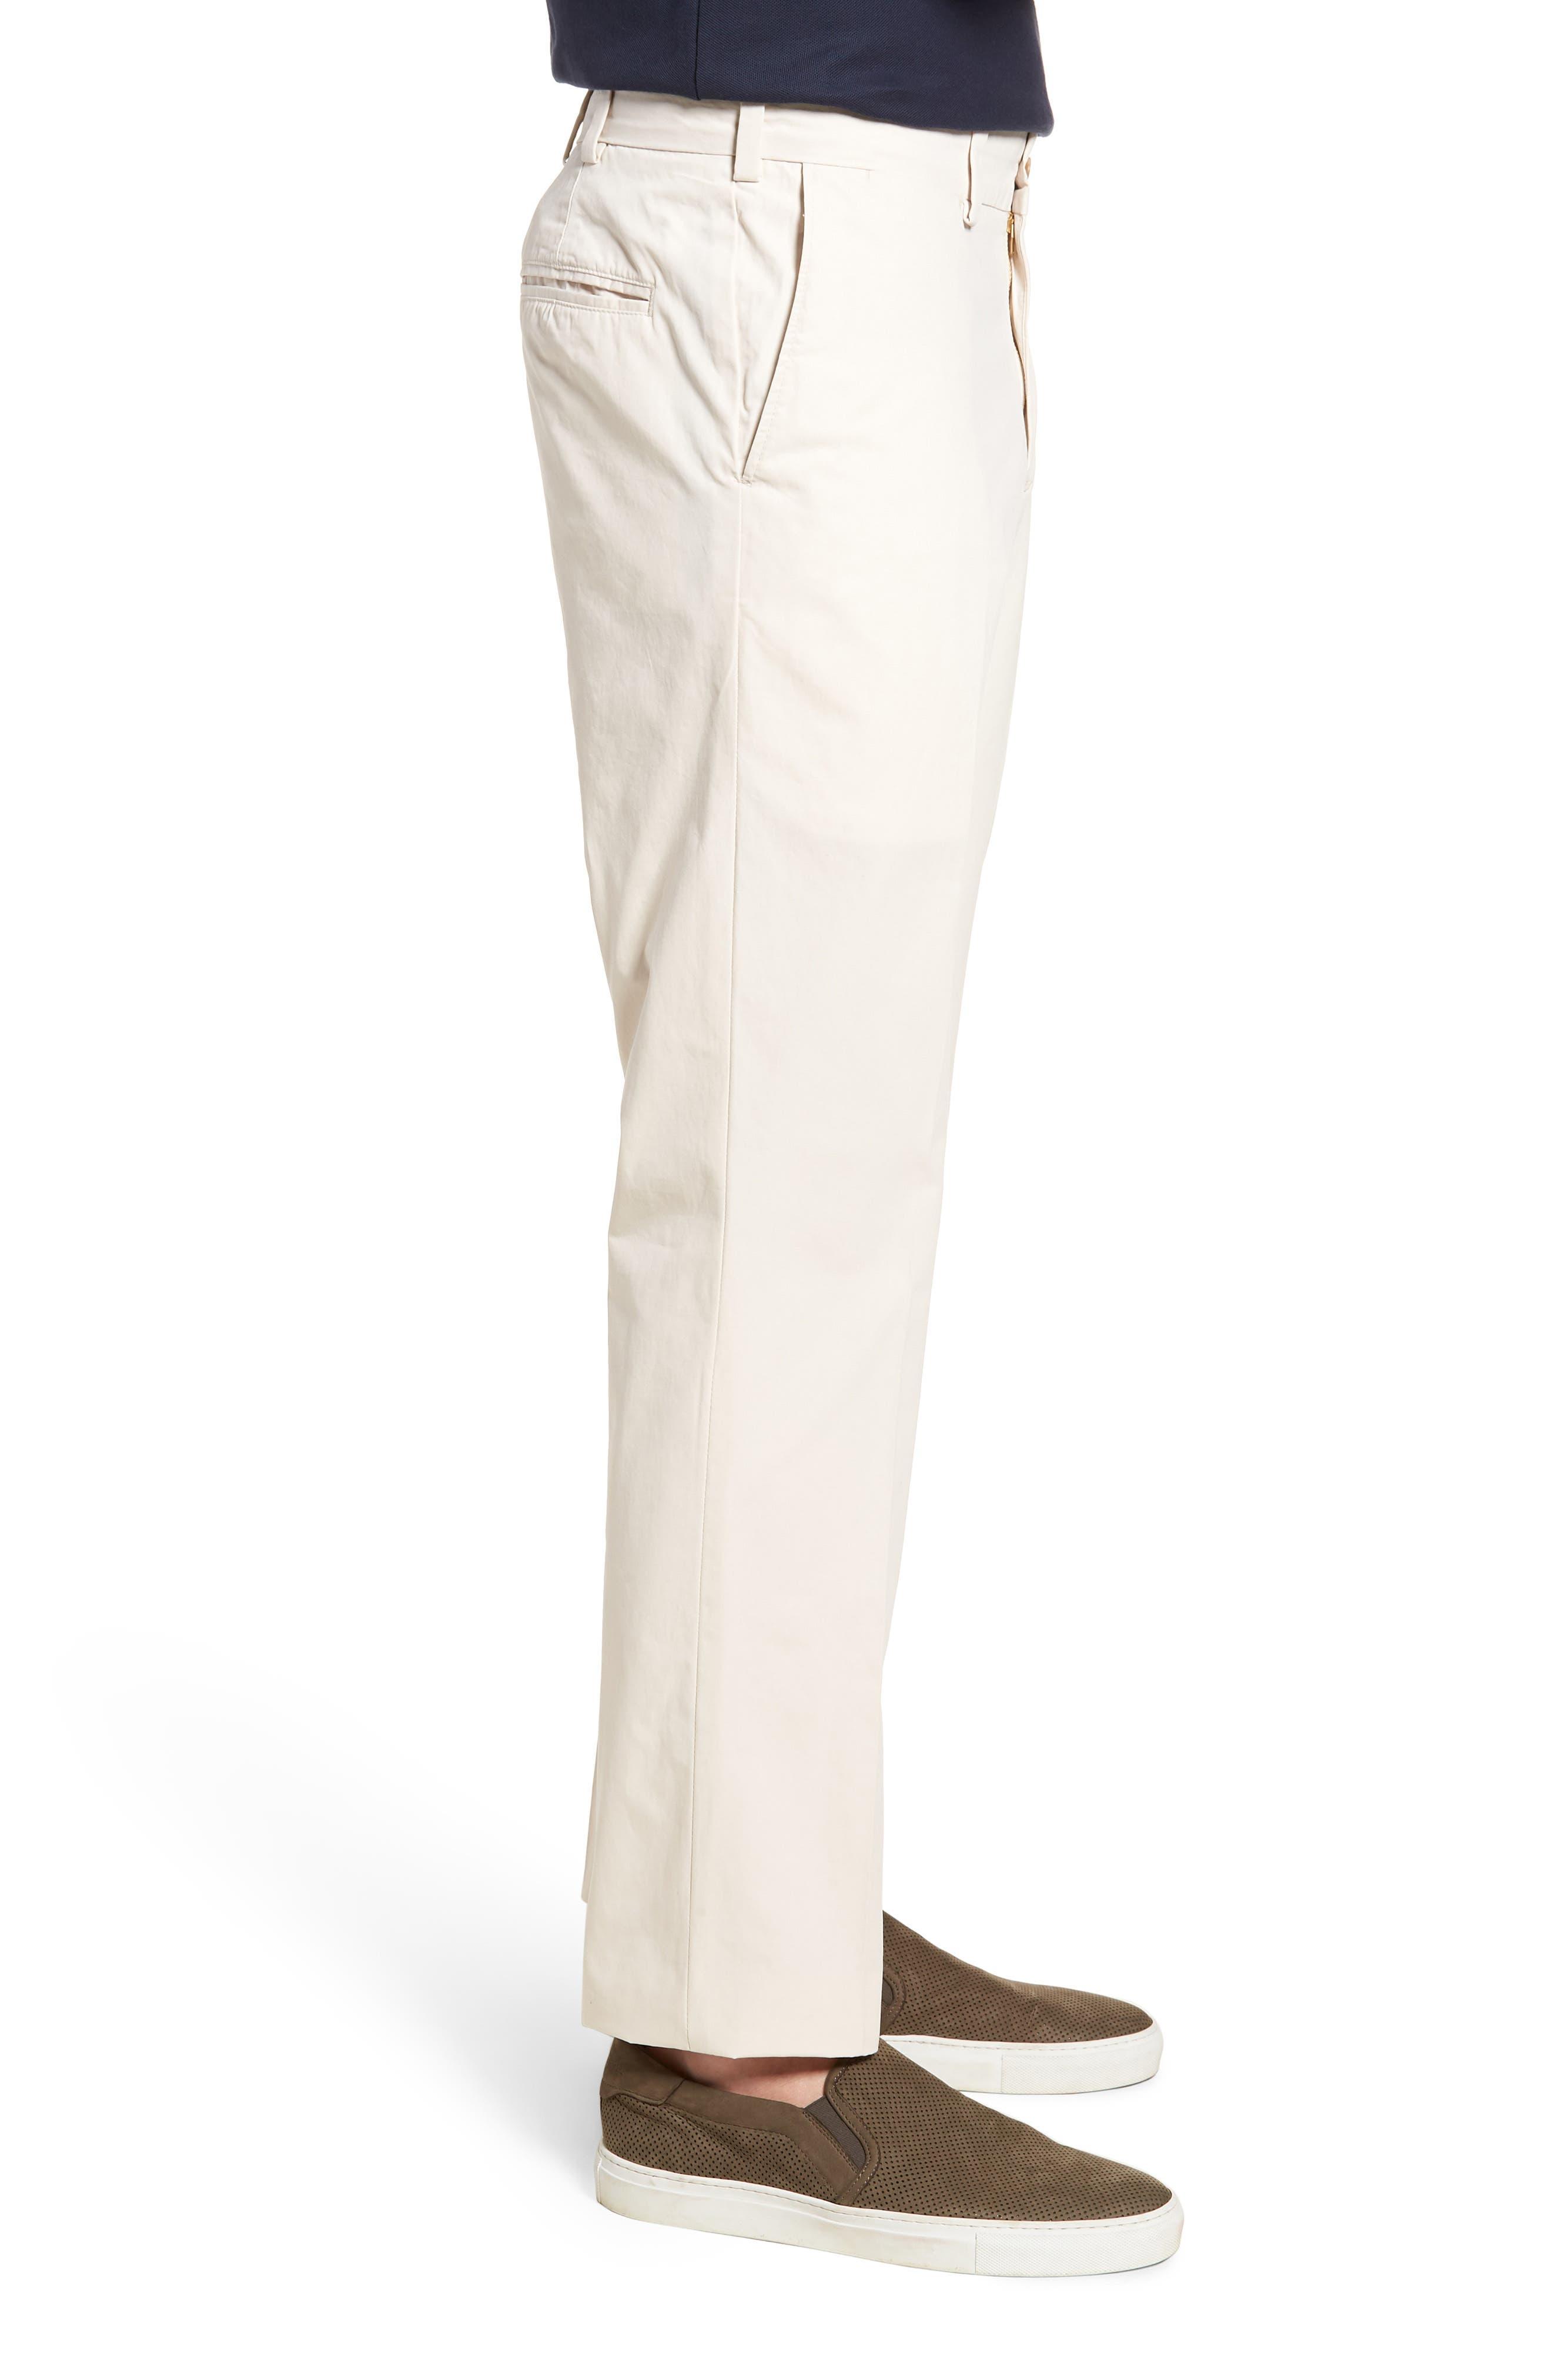 M3 Straight Fit Flat Front Tropical Poplin Pants,                             Alternate thumbnail 3, color,                             Sand